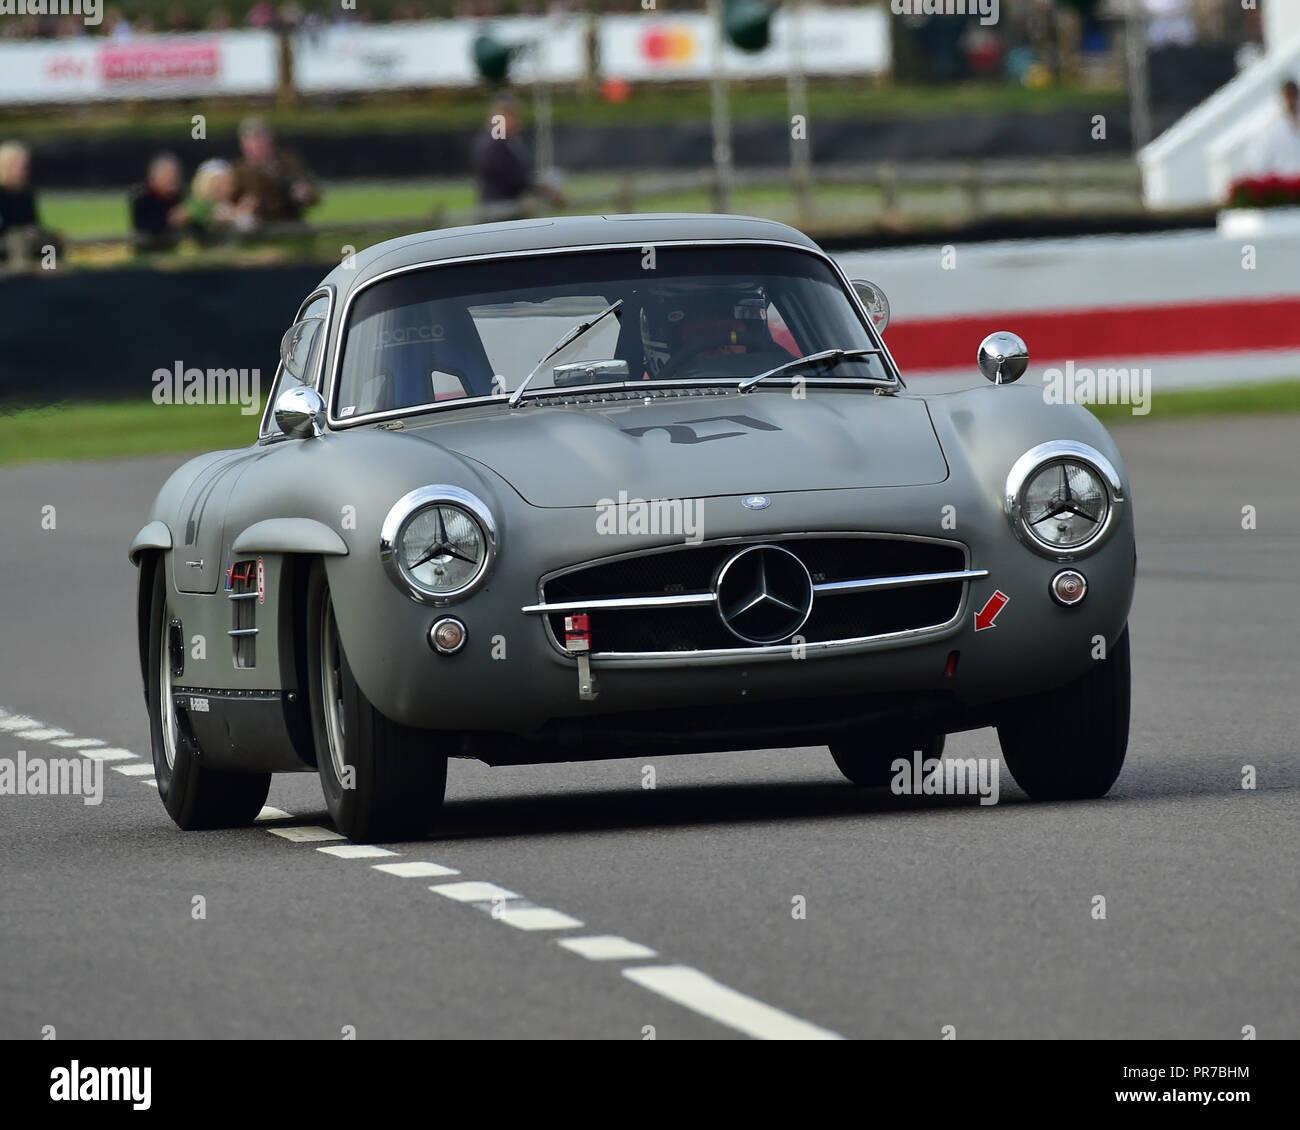 Jochen Mass, Mercedes 300 SL Flügeltürer, Freddie März Memorial Trophy, Sportwagen, 1952 bis 1955, Goodwood Revival 2018, September 2018, Autos, Stockbild